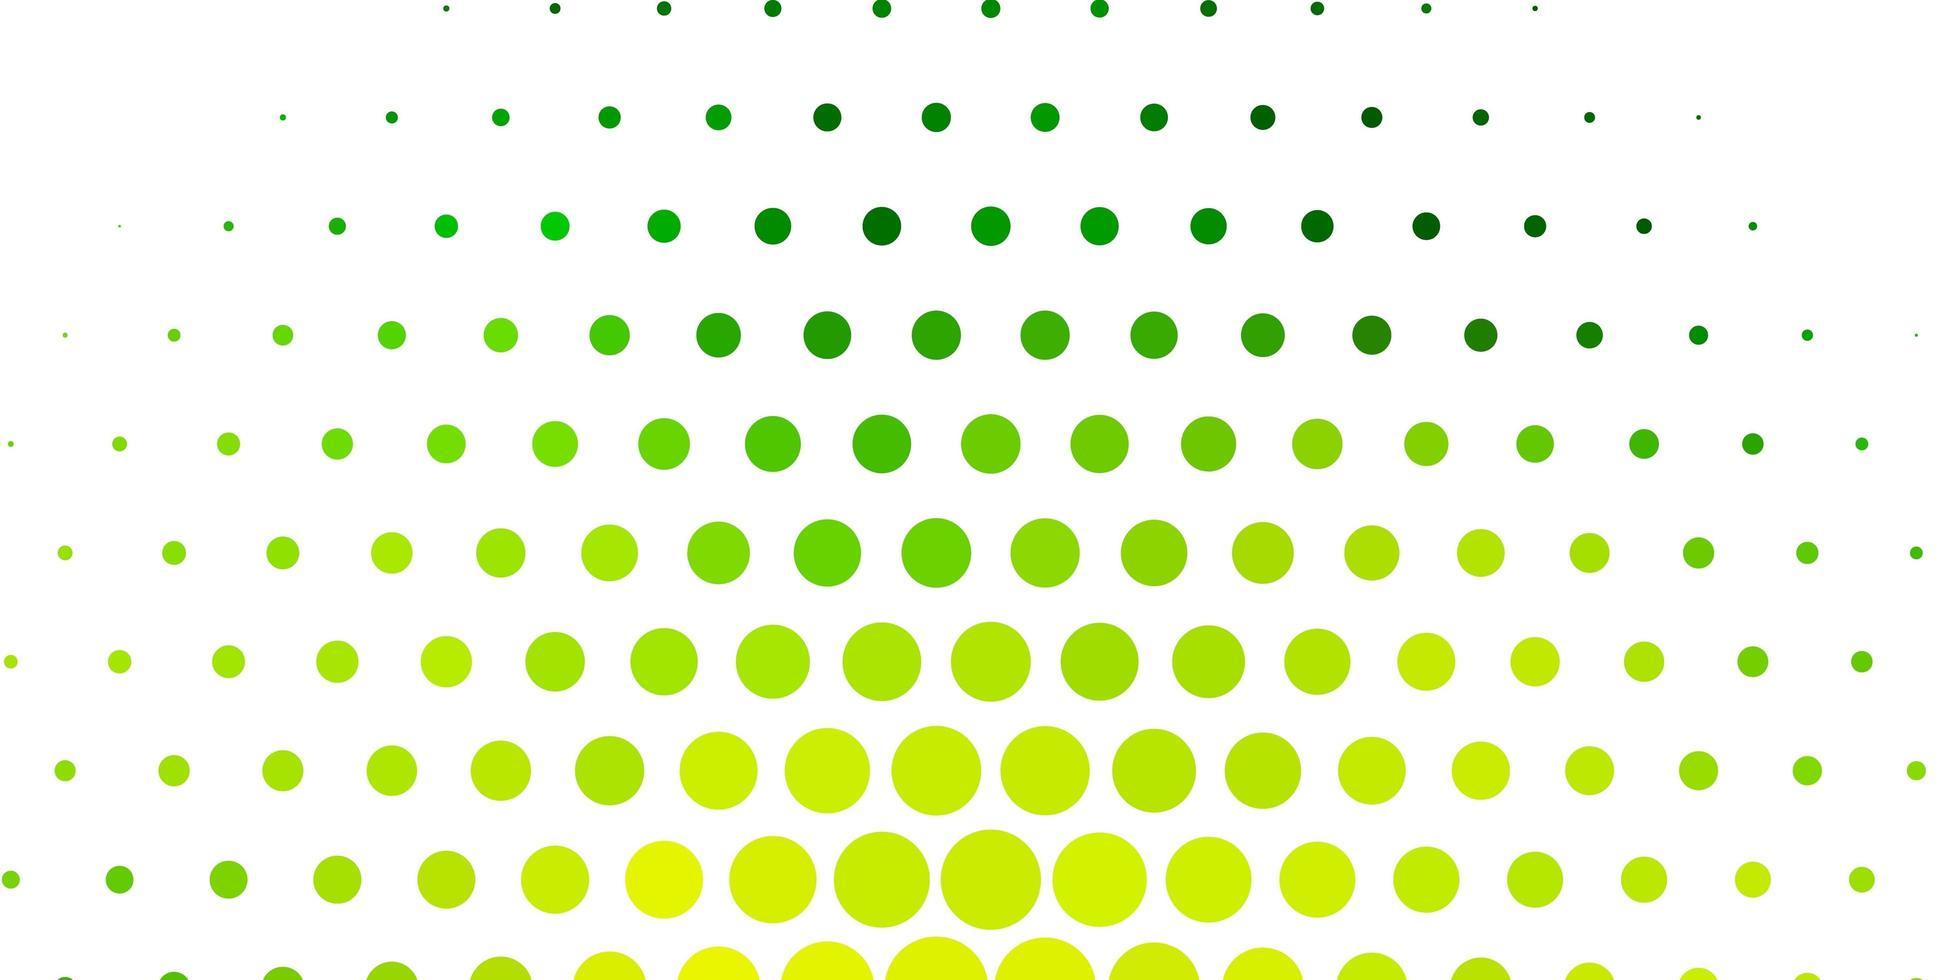 lichtgroene, gele vectorlay-out met cirkelvormen. vector